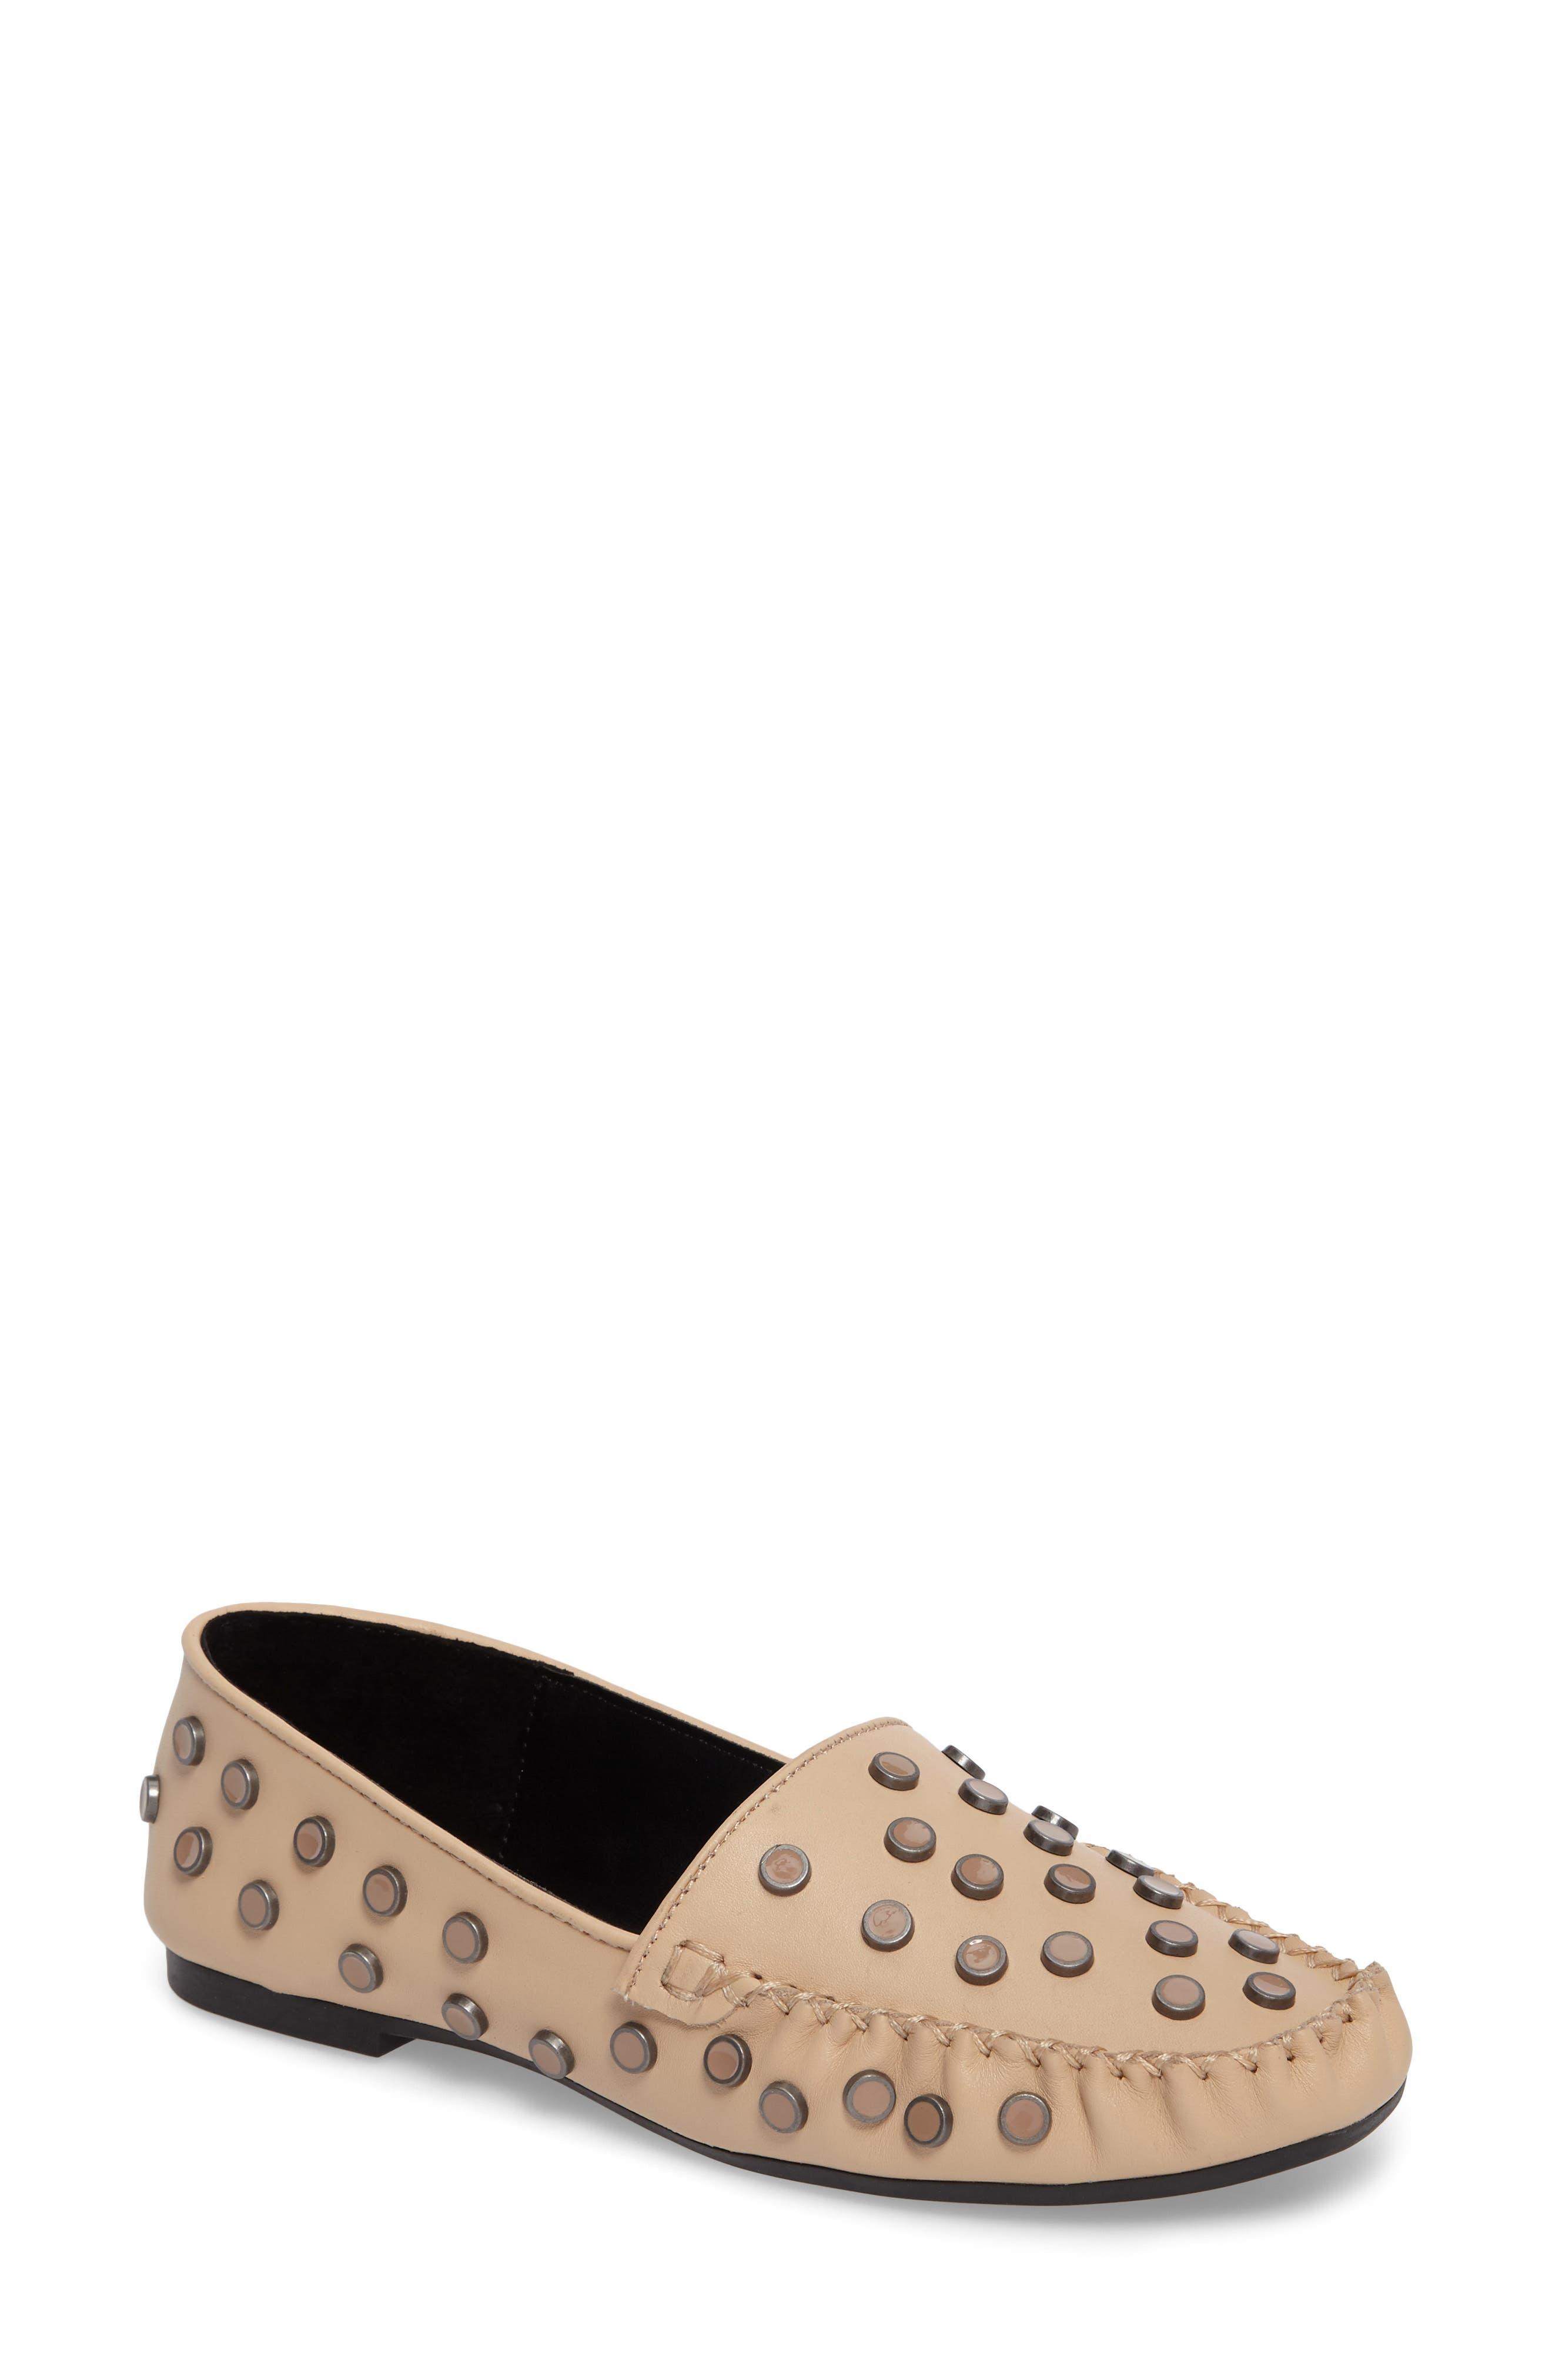 M4D3 Conneticut Loafer,                         Main,                         color, Bisque Leather